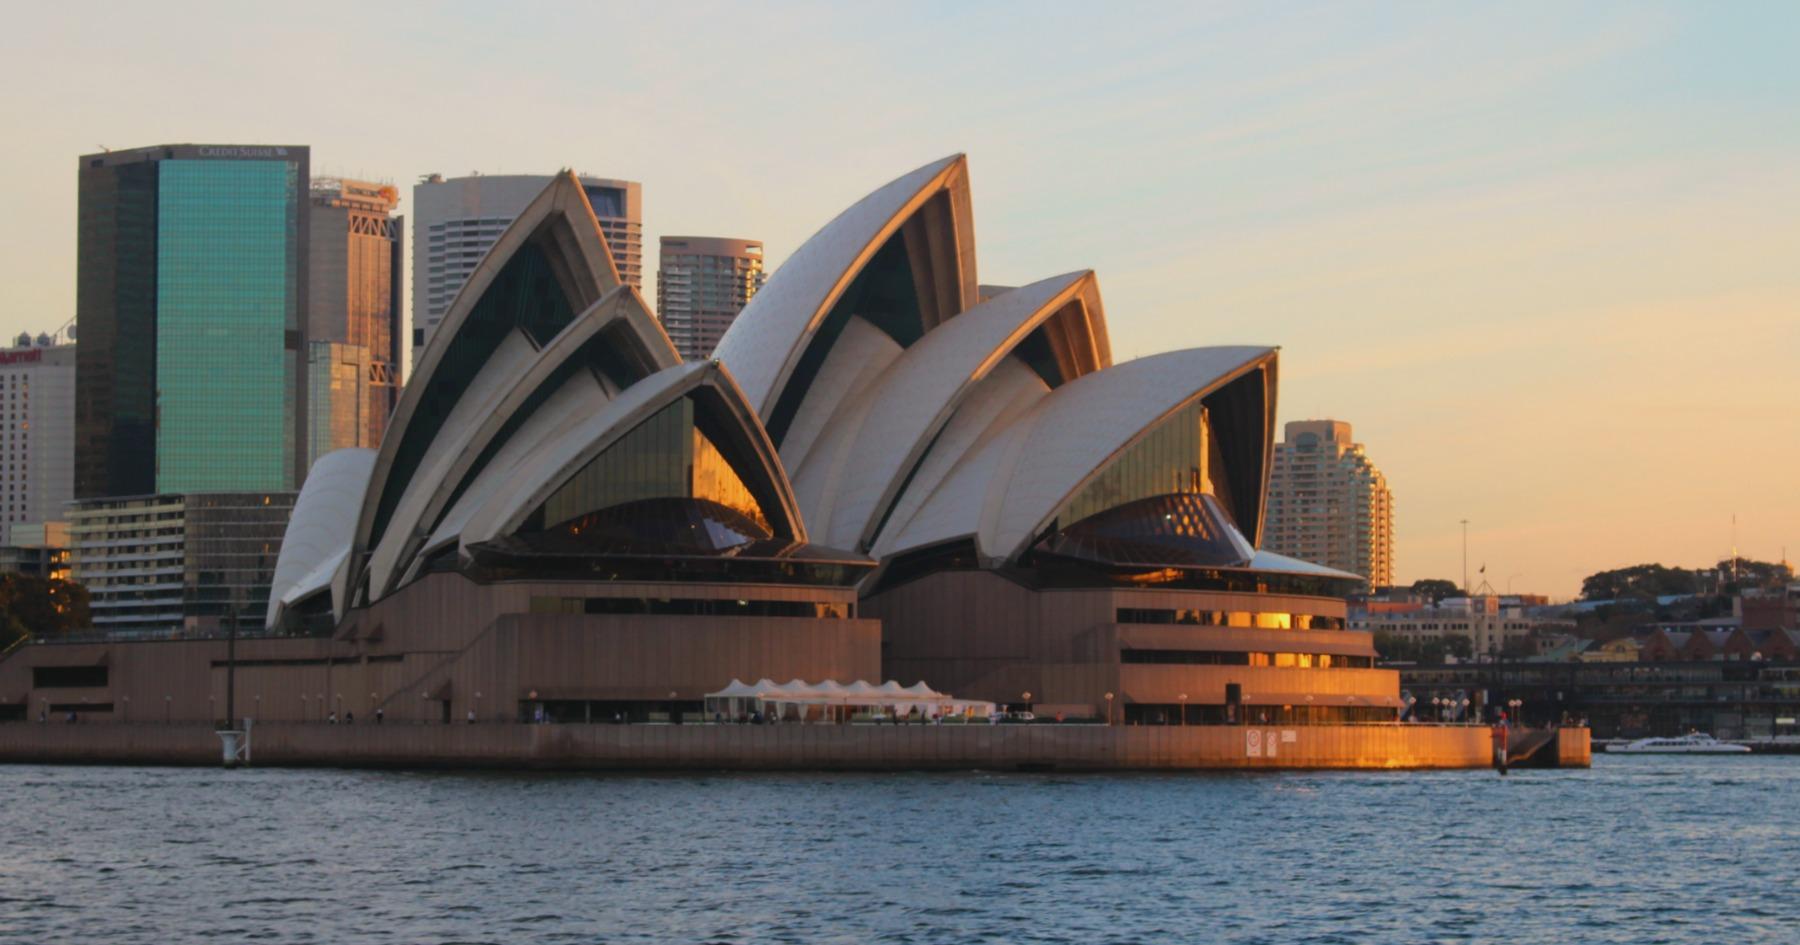 Sydney Opera House - 10 tòa nhà đẹp nhất ở Sydney